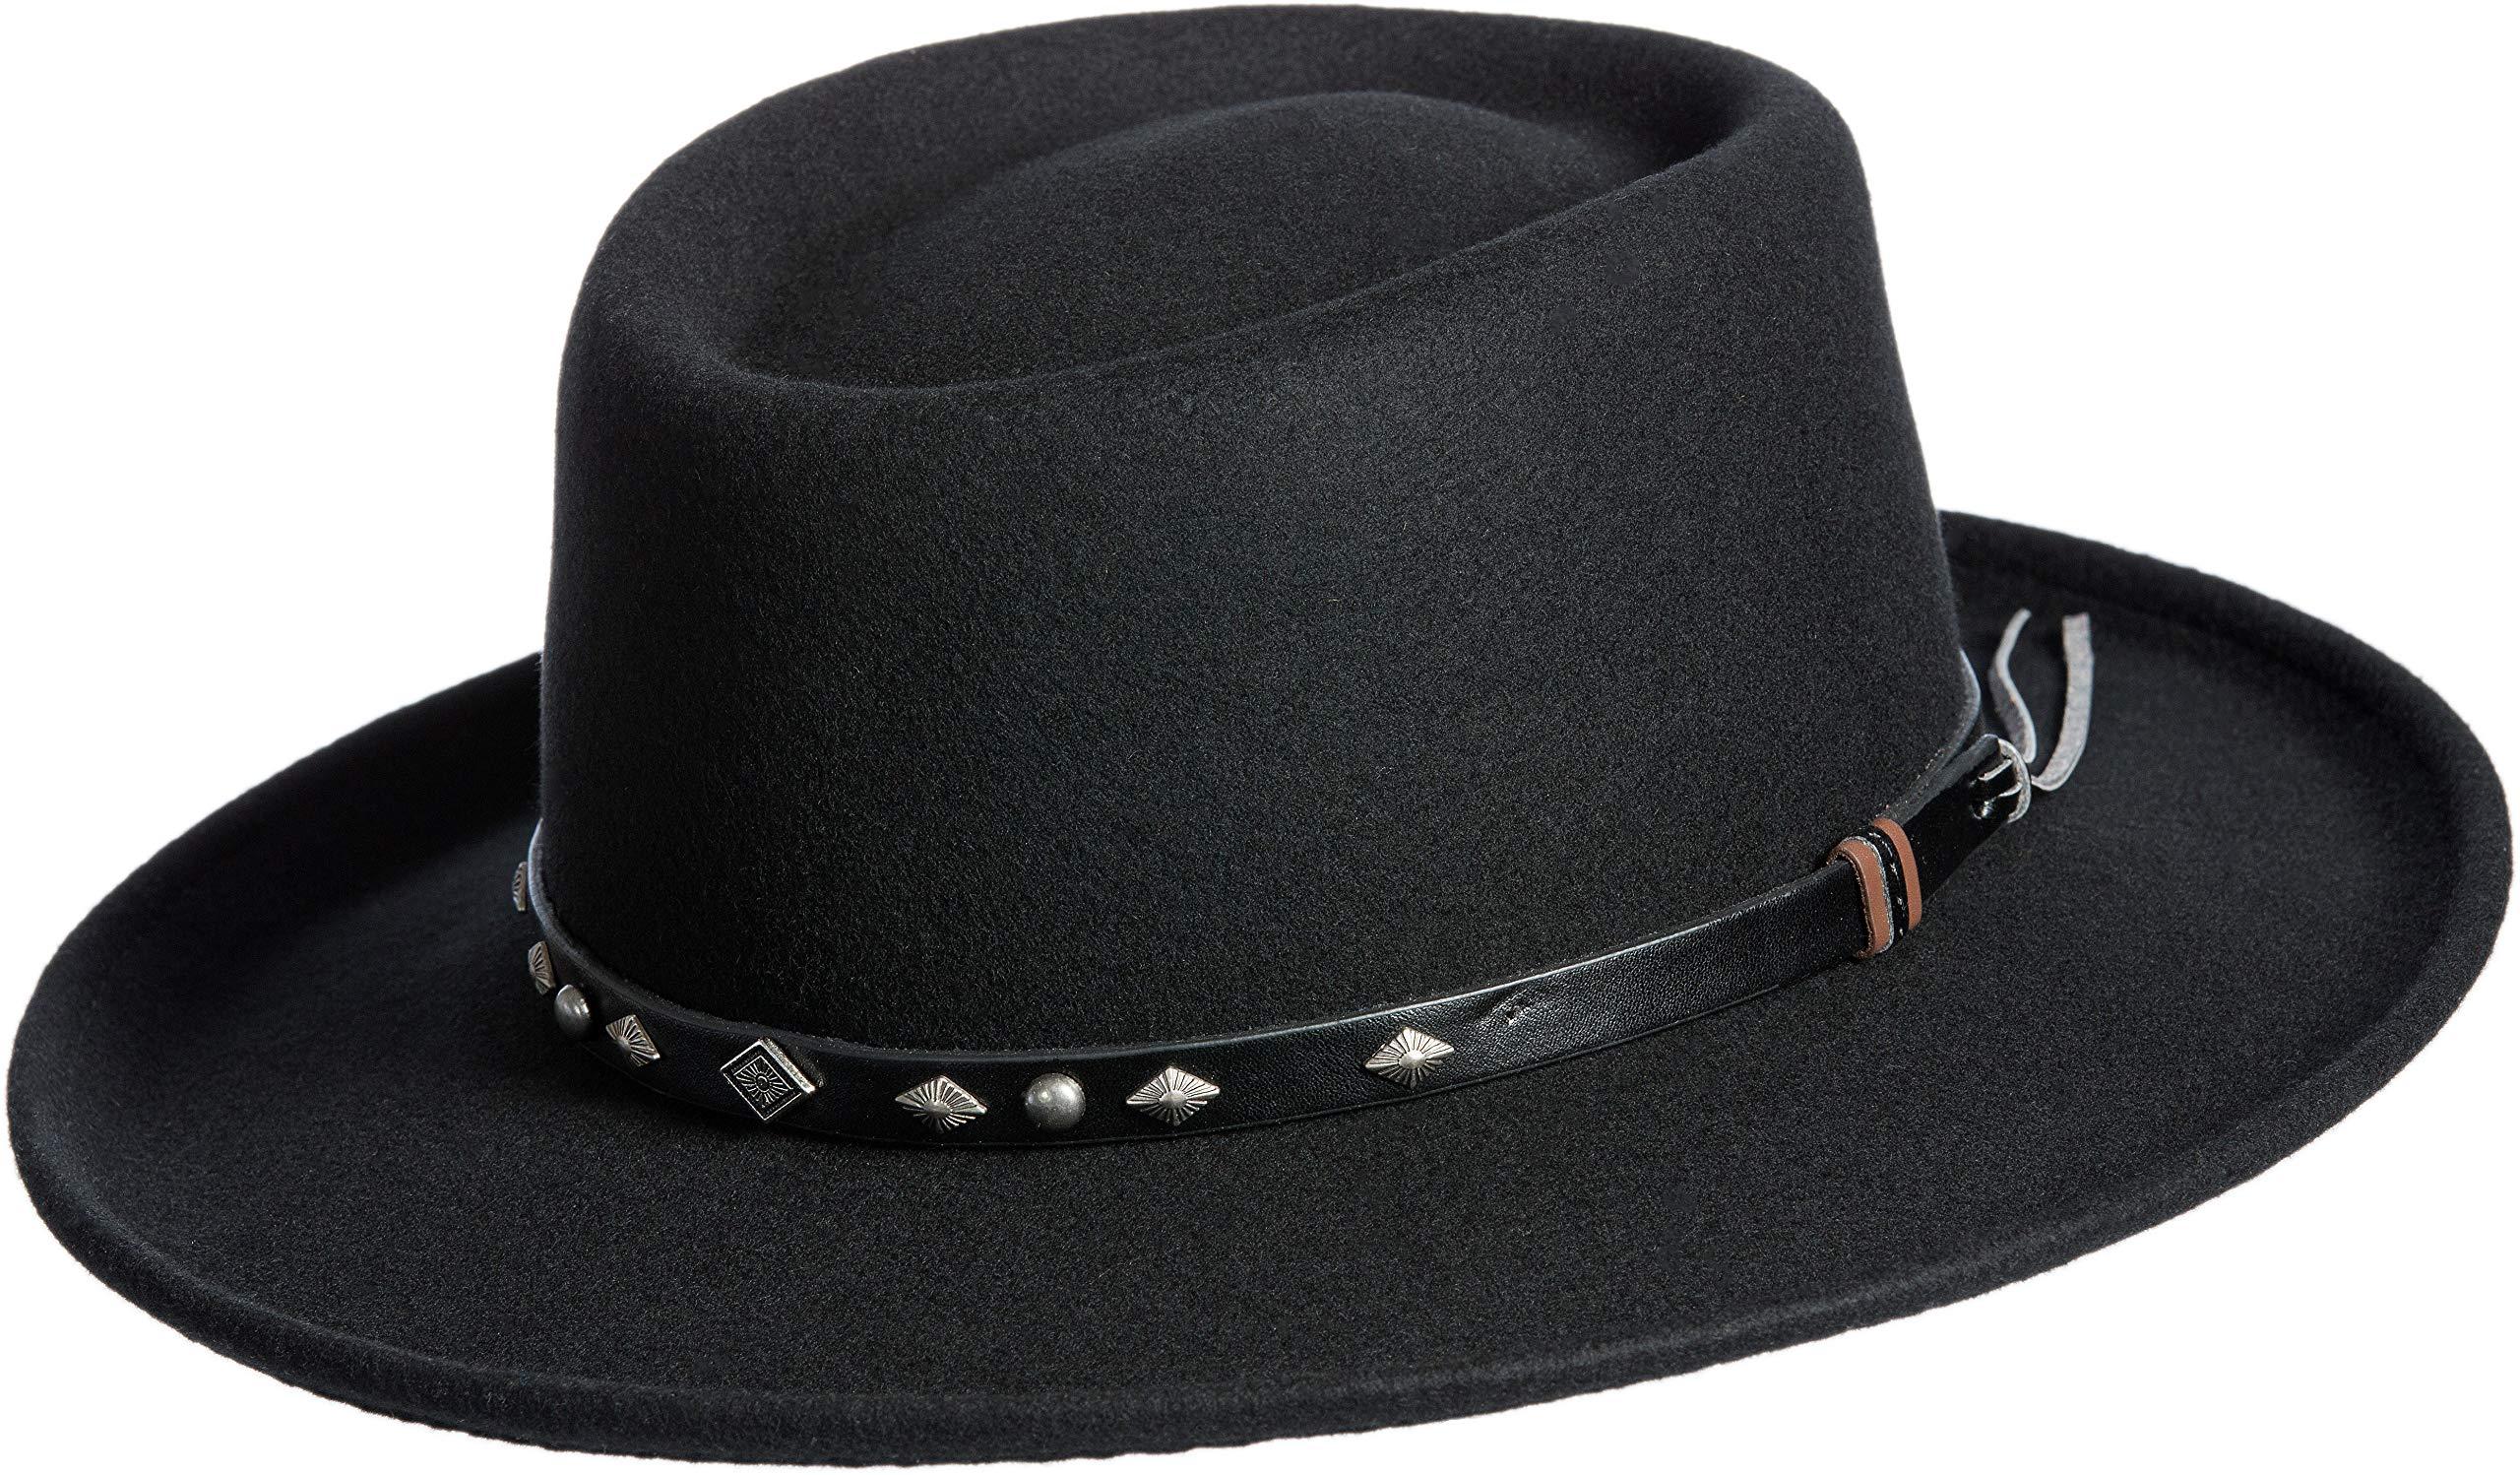 Overland Sheepskin Co Quincy Crushable Wool Waterproof Gambler Hat Black by Overland Sheepskin Co